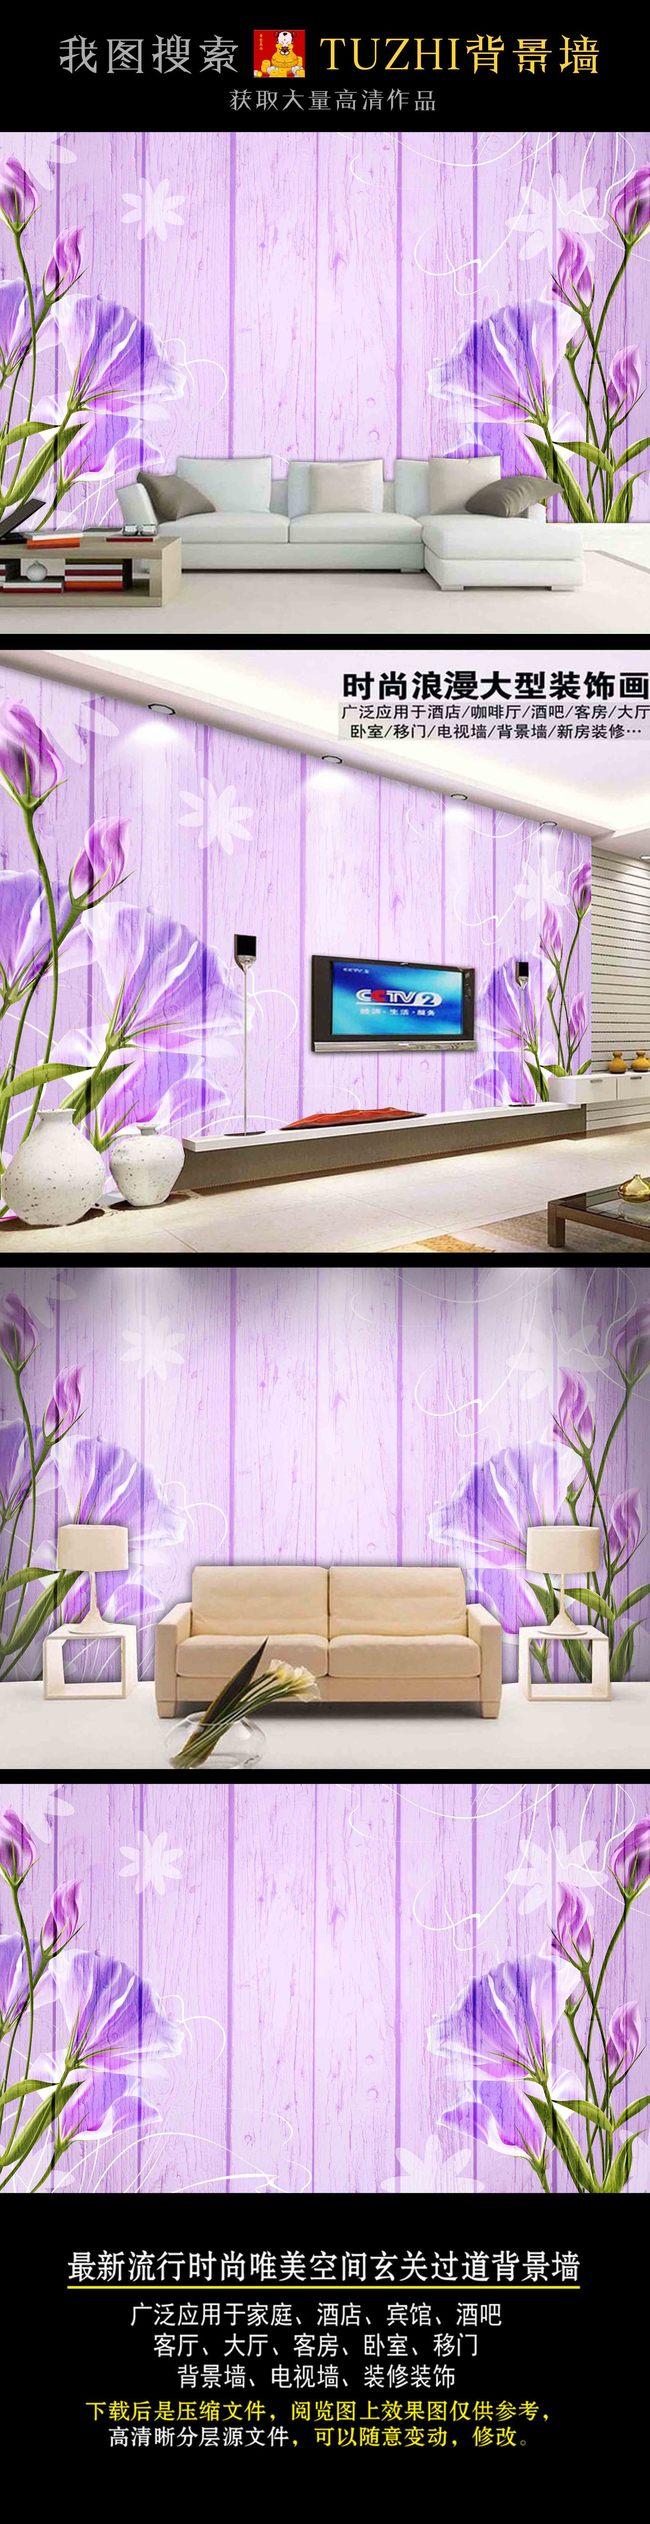 3d木纹花卉温馨唯美欧式手绘电视背景墙